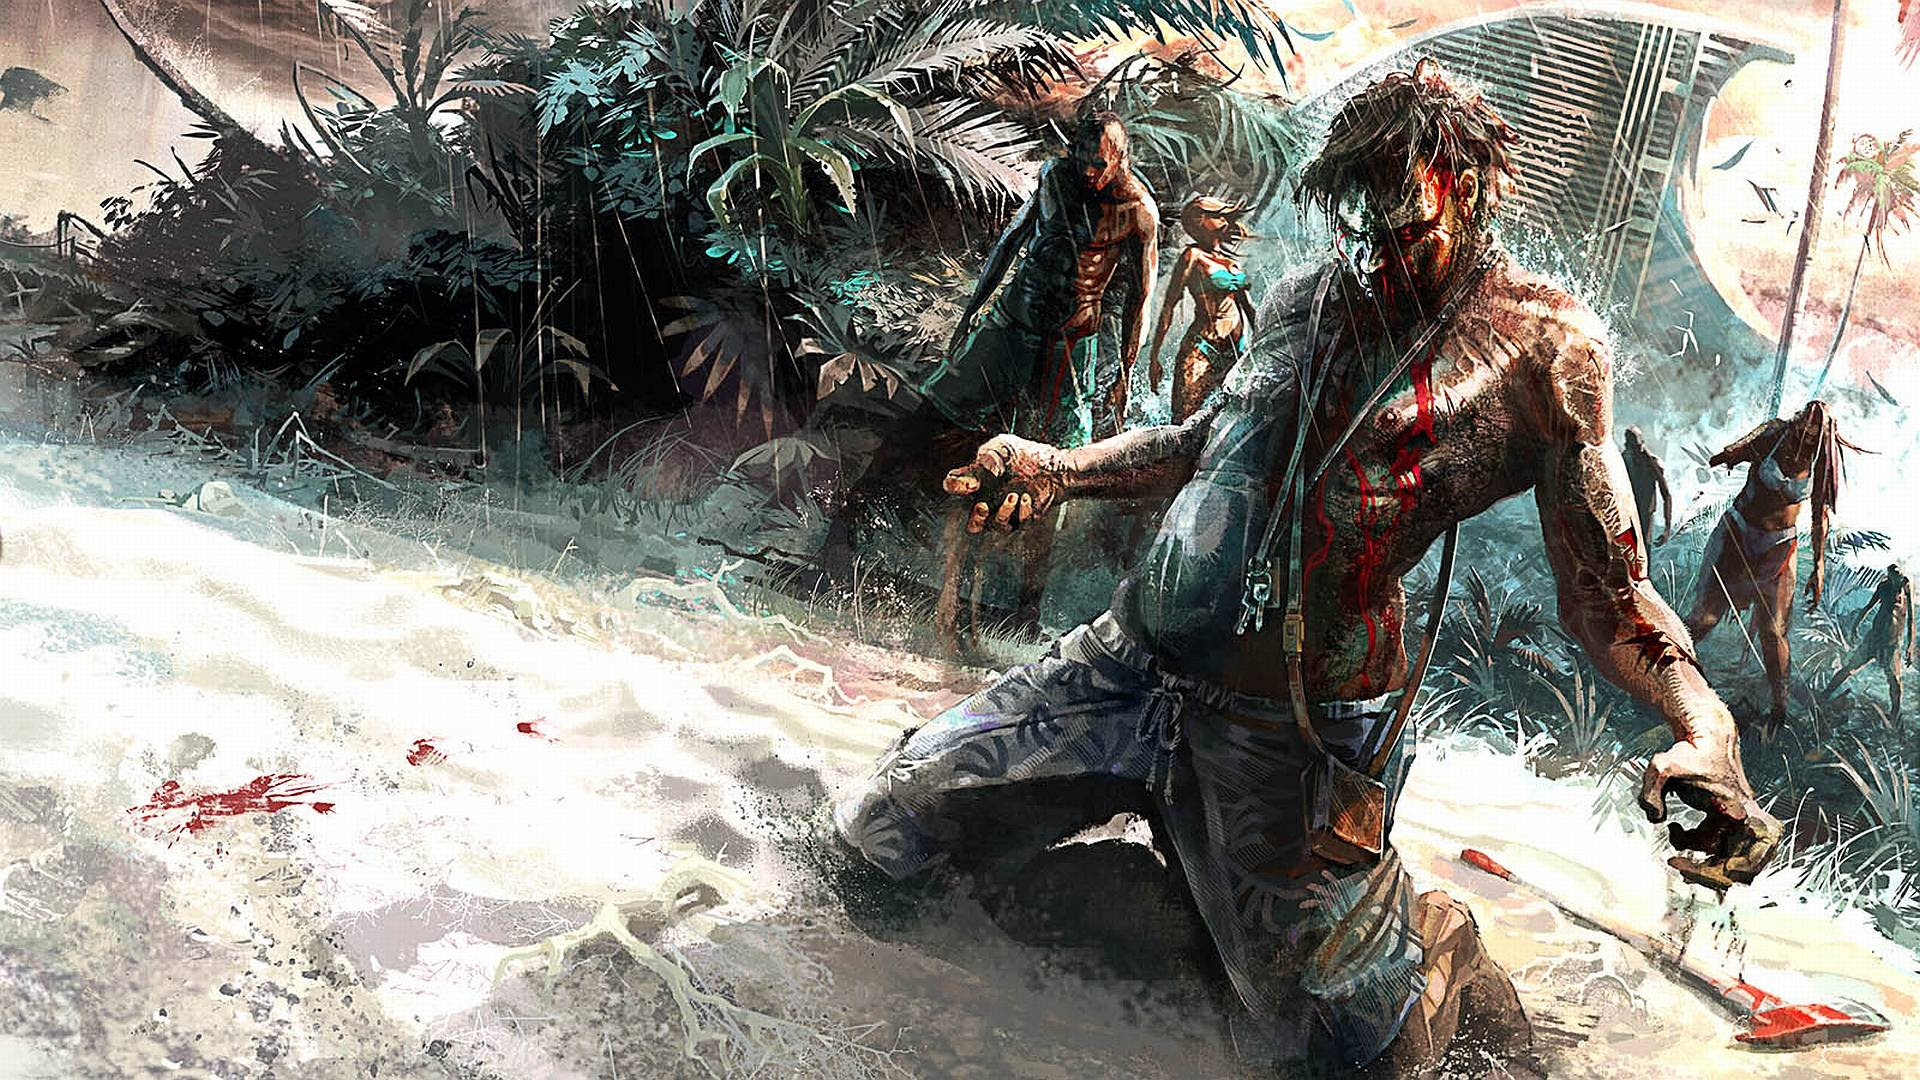 Resultado de imagem para dead island wallpaper